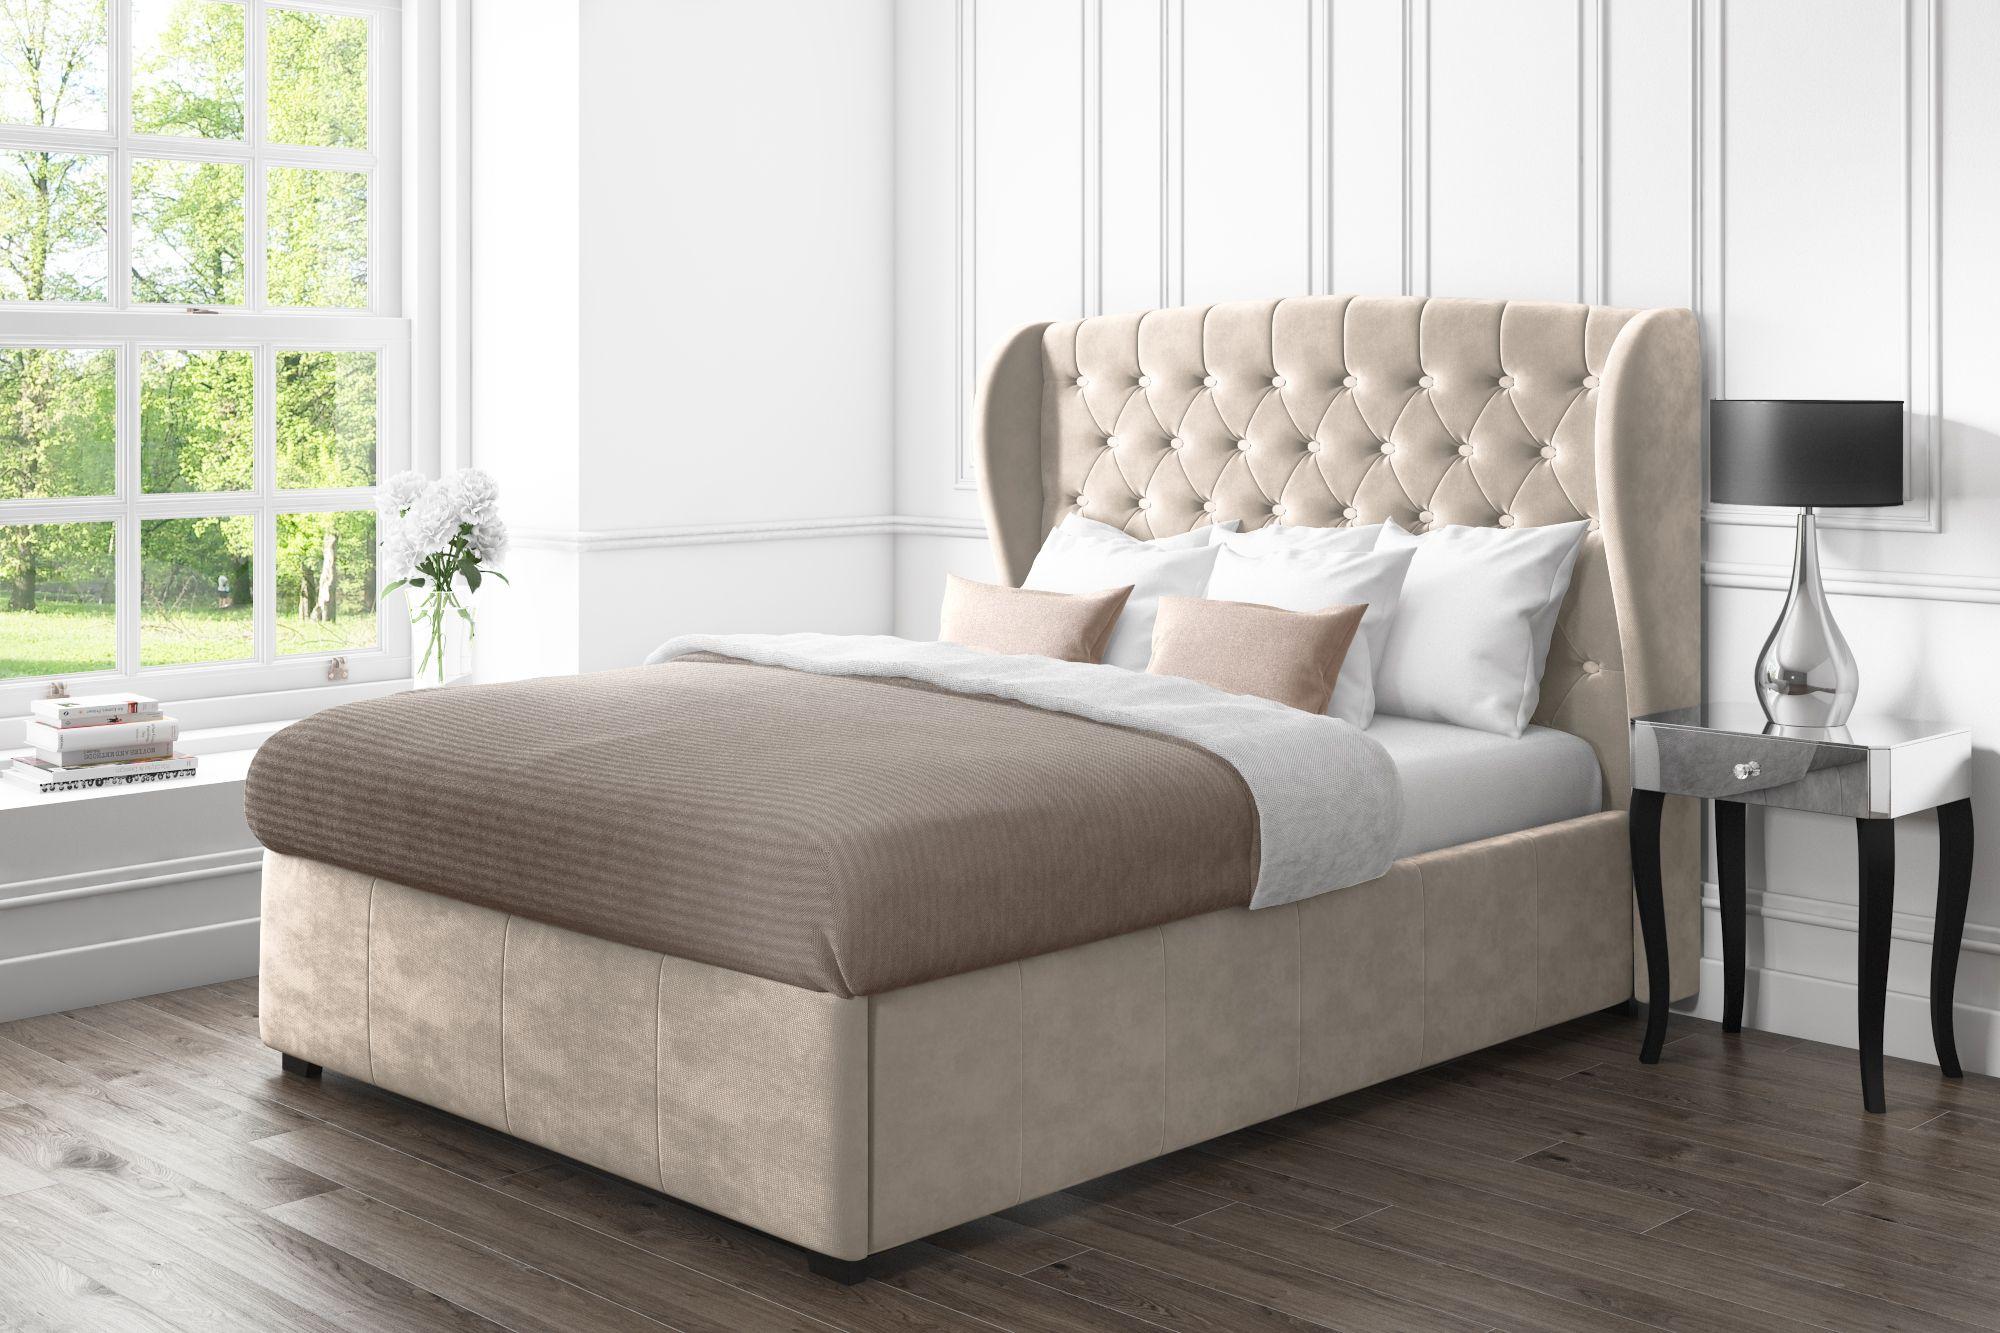 Pleasing Safina Wing Back Double Ottoman Bed In Beige Velvet Saf022 Spiritservingveterans Wood Chair Design Ideas Spiritservingveteransorg